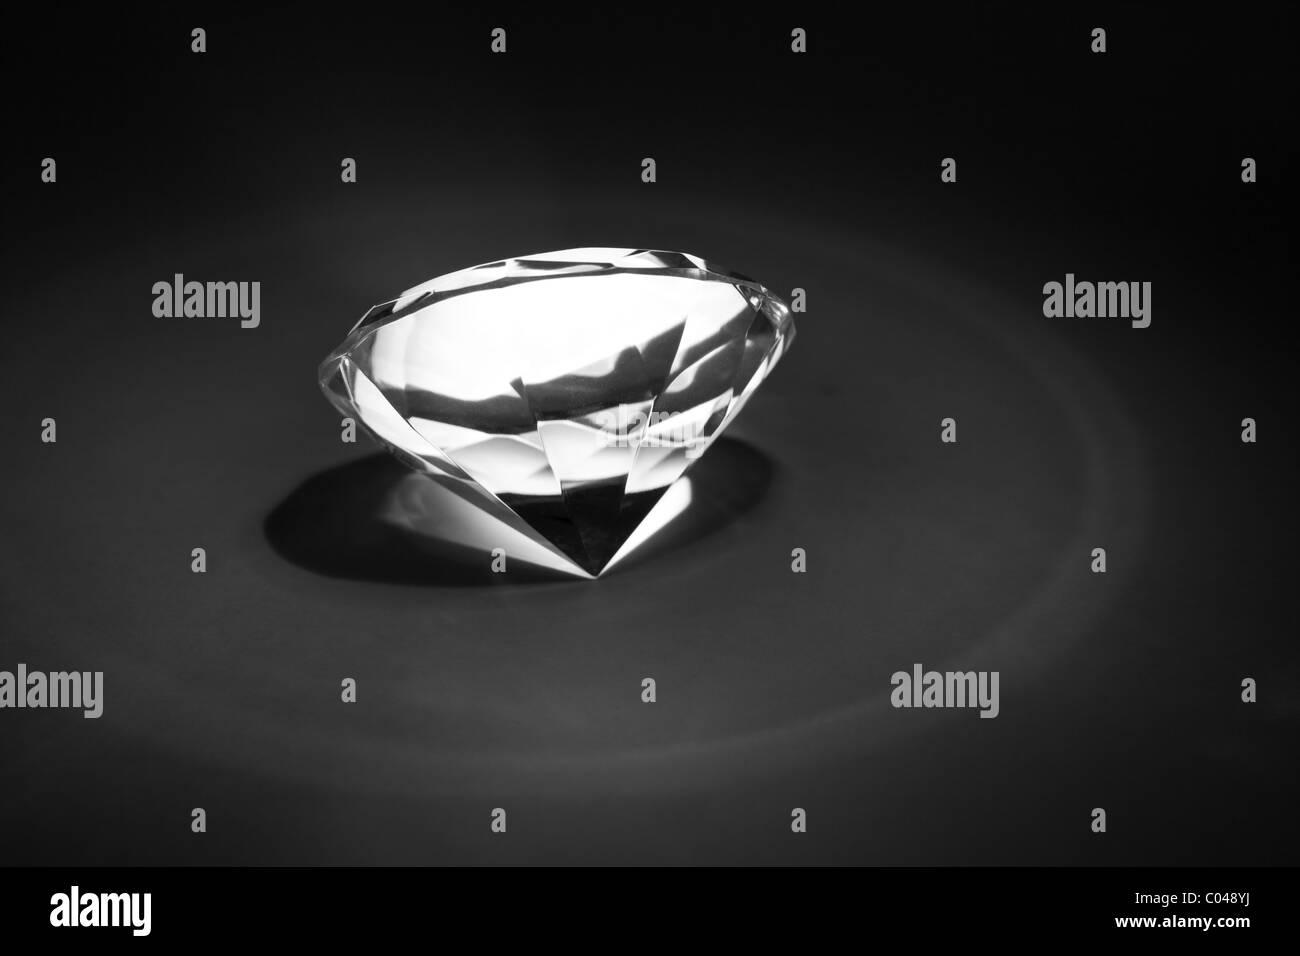 Diamond close up shot - Stock Image